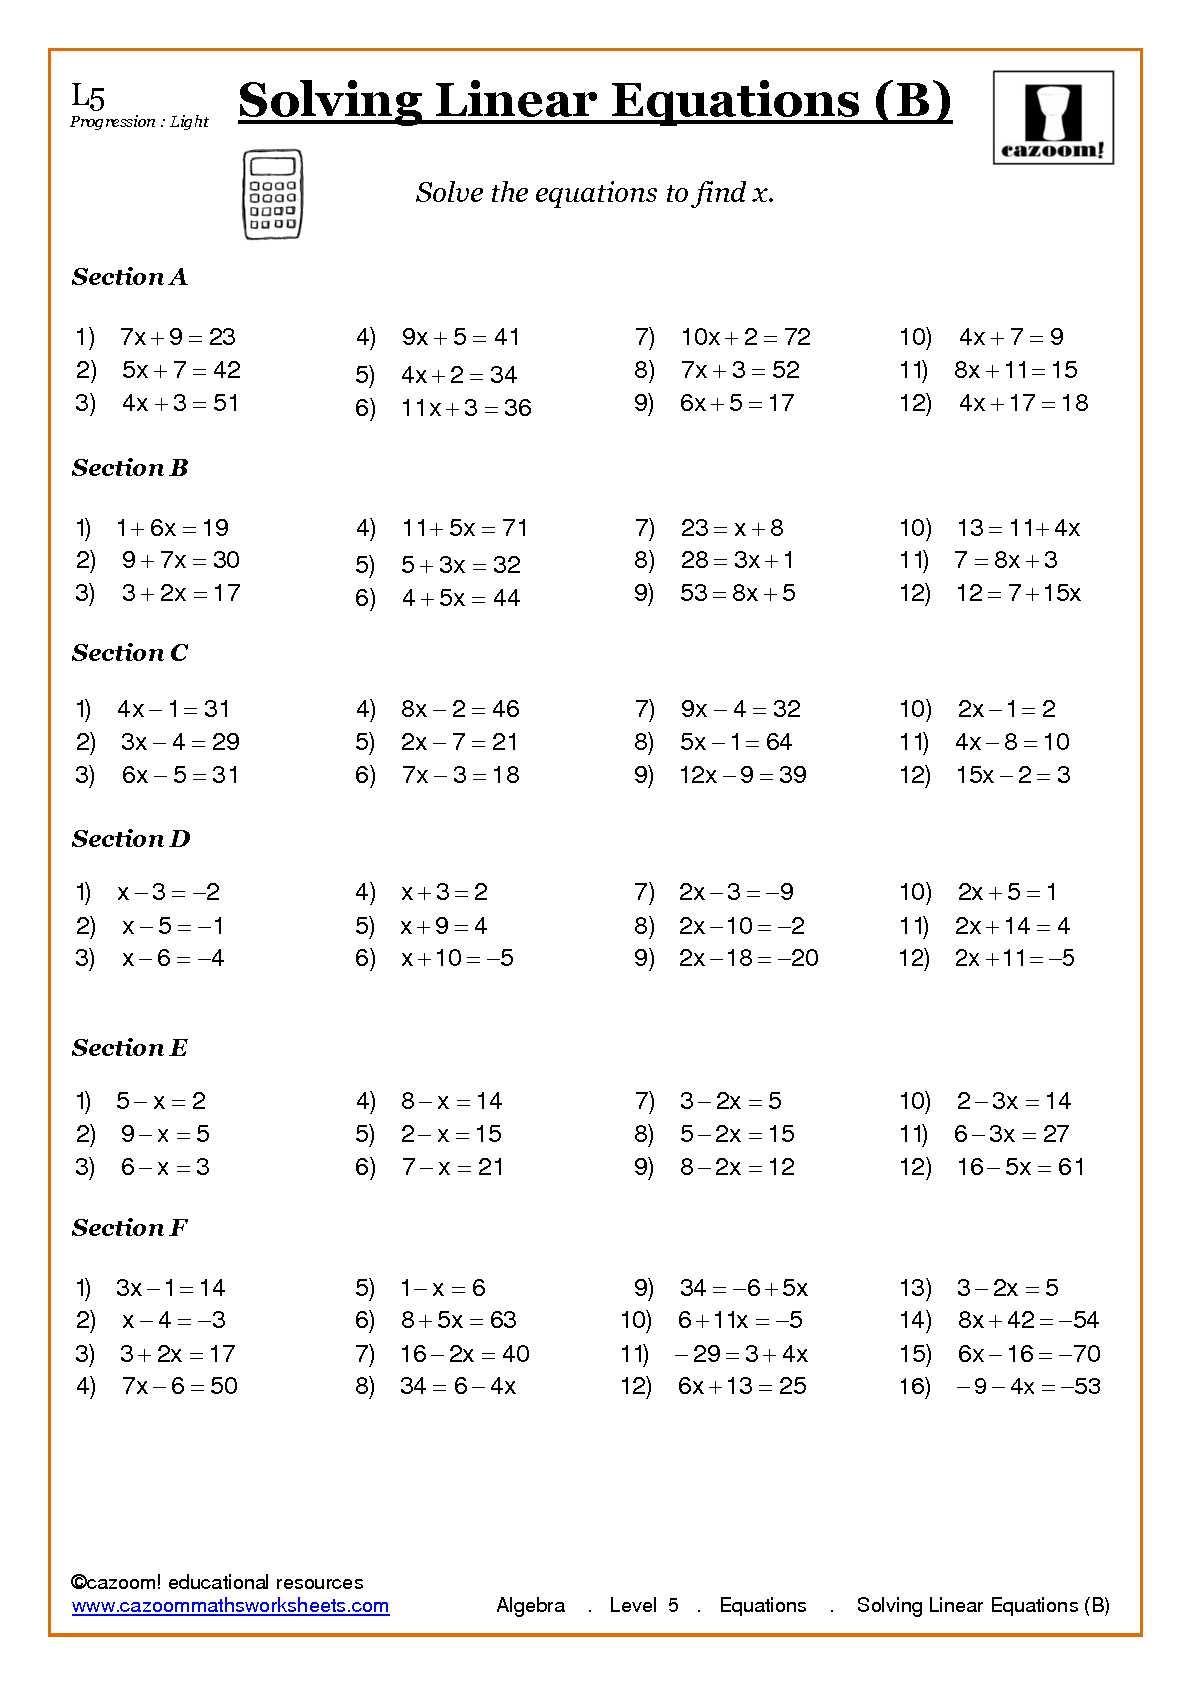 Algebra Solving Equations At Ks3 And Ks4 | Algebra inside Multiplication Worksheets Ks4